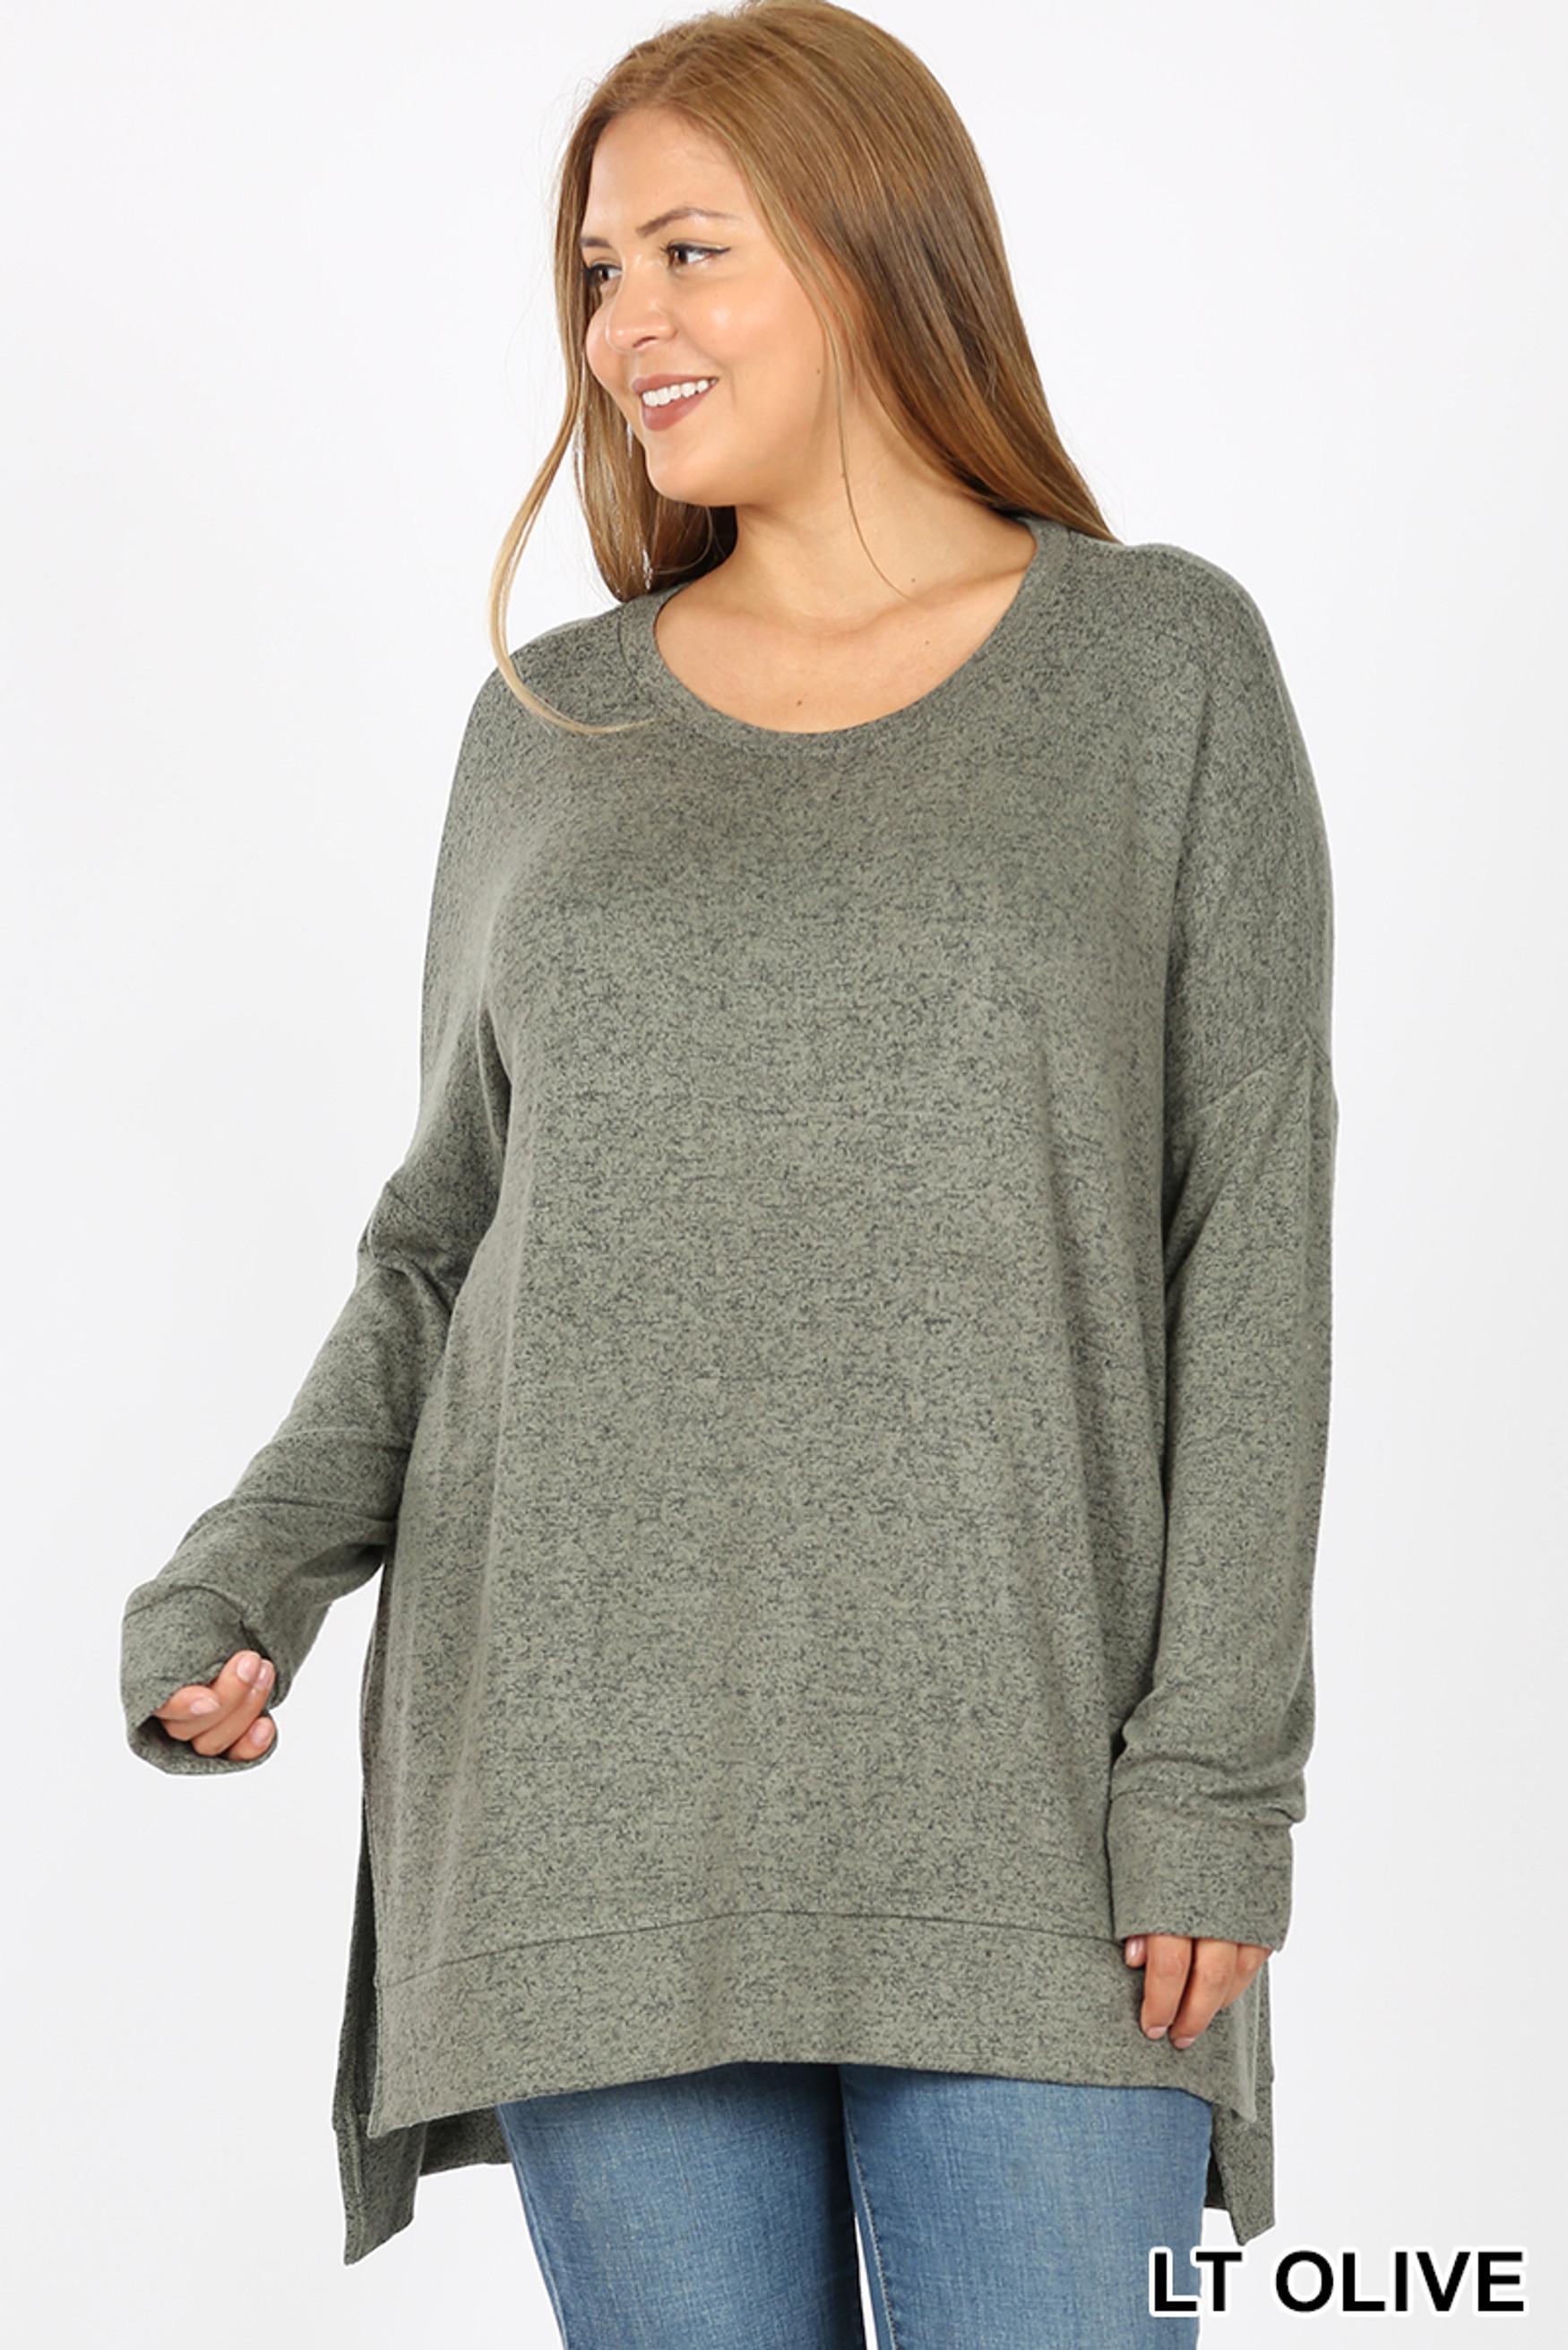 Brushed Melange Round Neck HI-LOW Plus Size Top